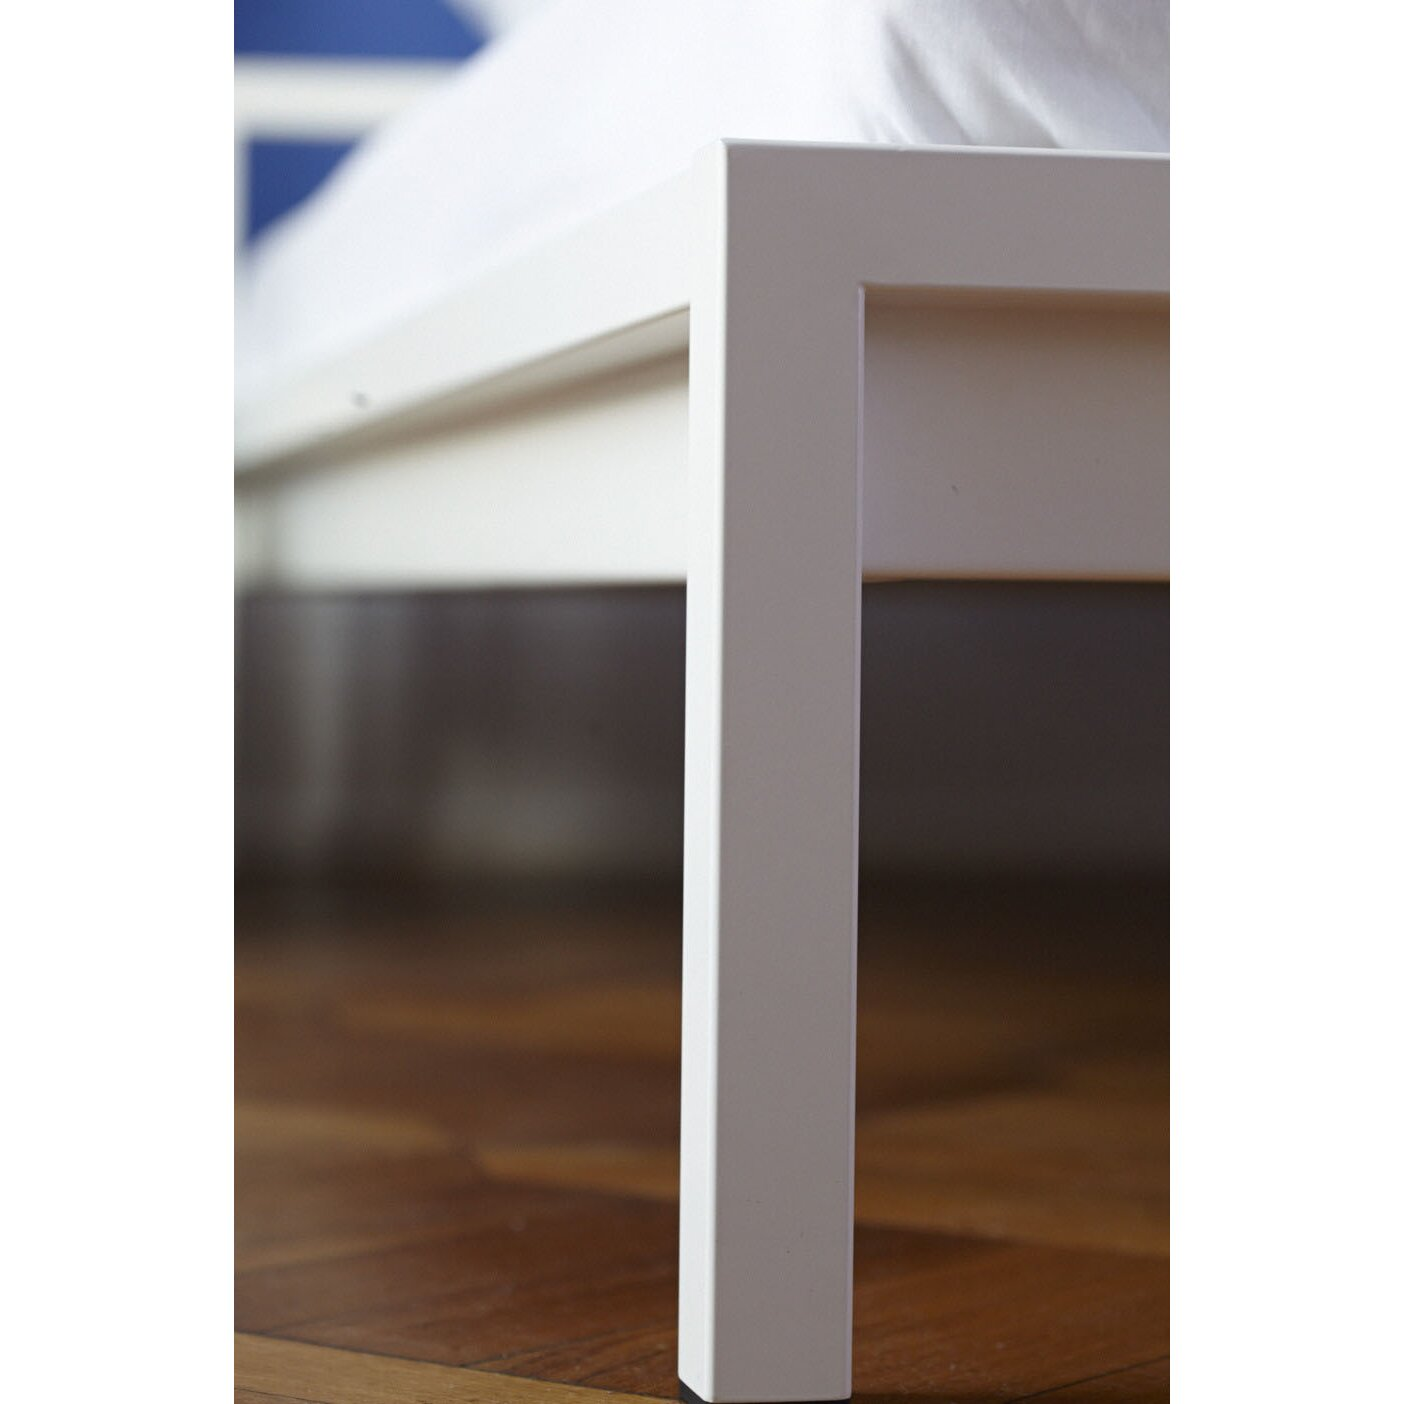 hans hansen furniture bettgestell pure bewertungen. Black Bedroom Furniture Sets. Home Design Ideas